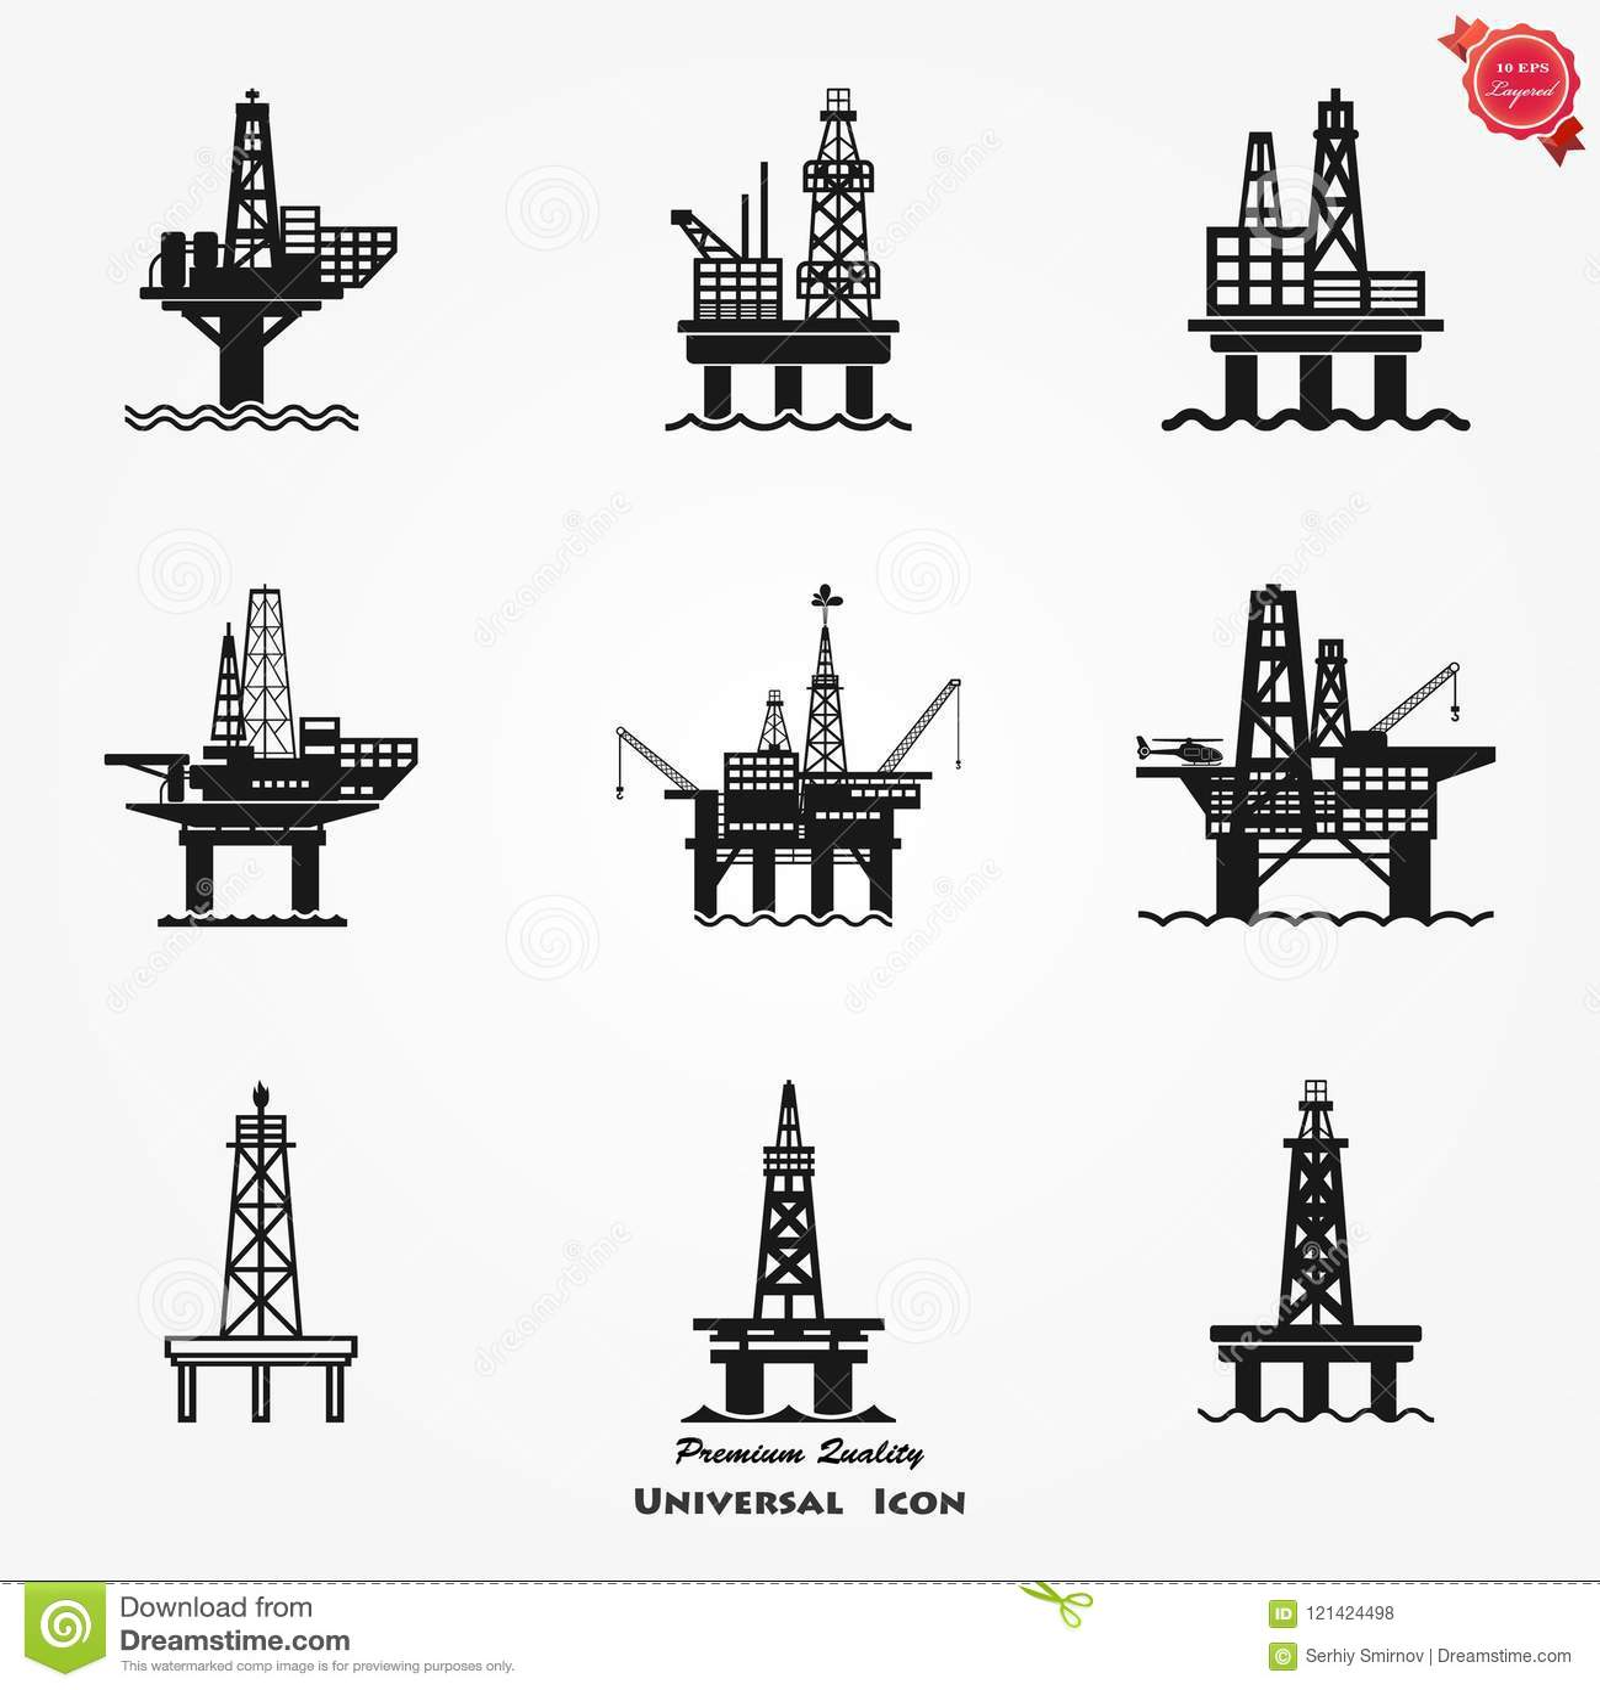 Bohrinselikone für Netz, Gas Meer Rig Platform Illustration, Brennstoff Produktions-Symbol